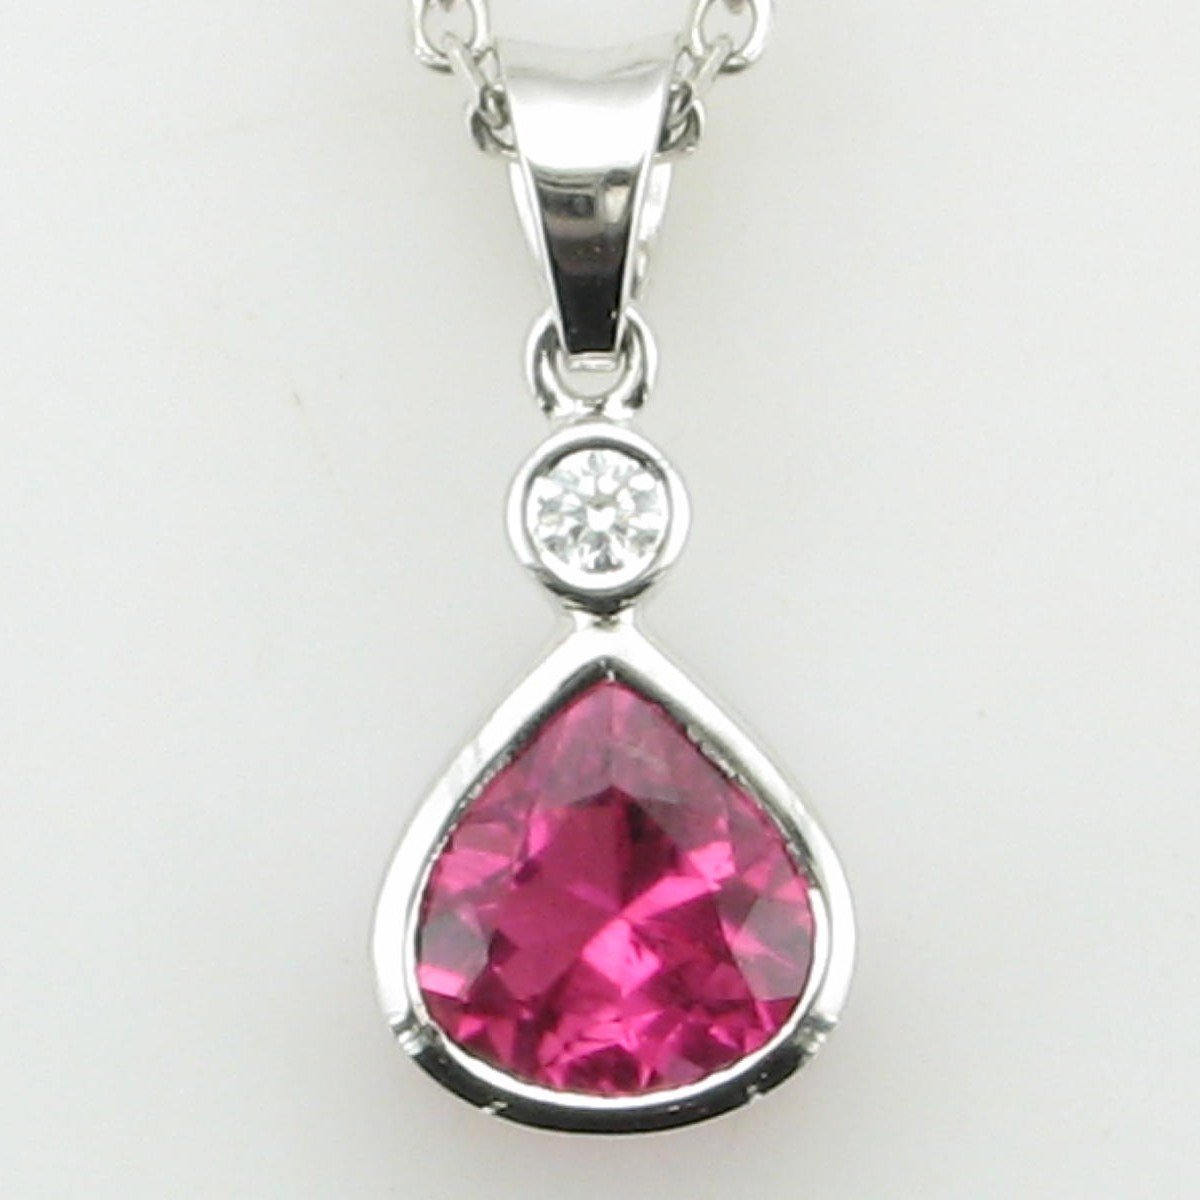 18K White Gold Designer Pear Pink Tourmaline and Diamond Pendant